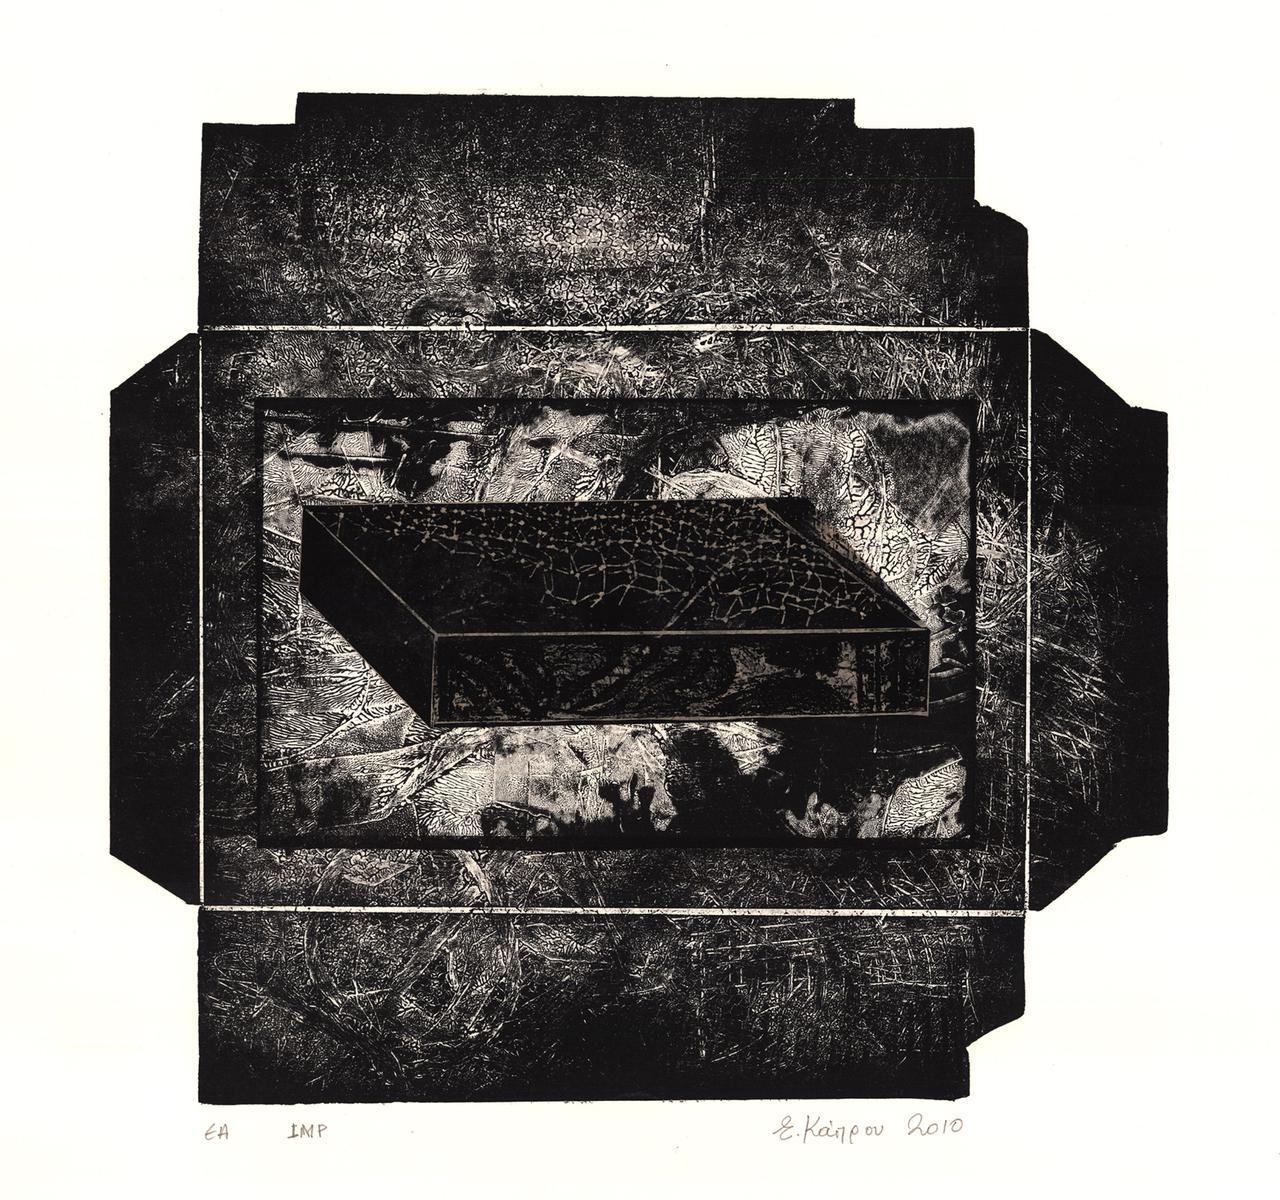 The black box of memory, 34.5 x 36.5 cm, 2012